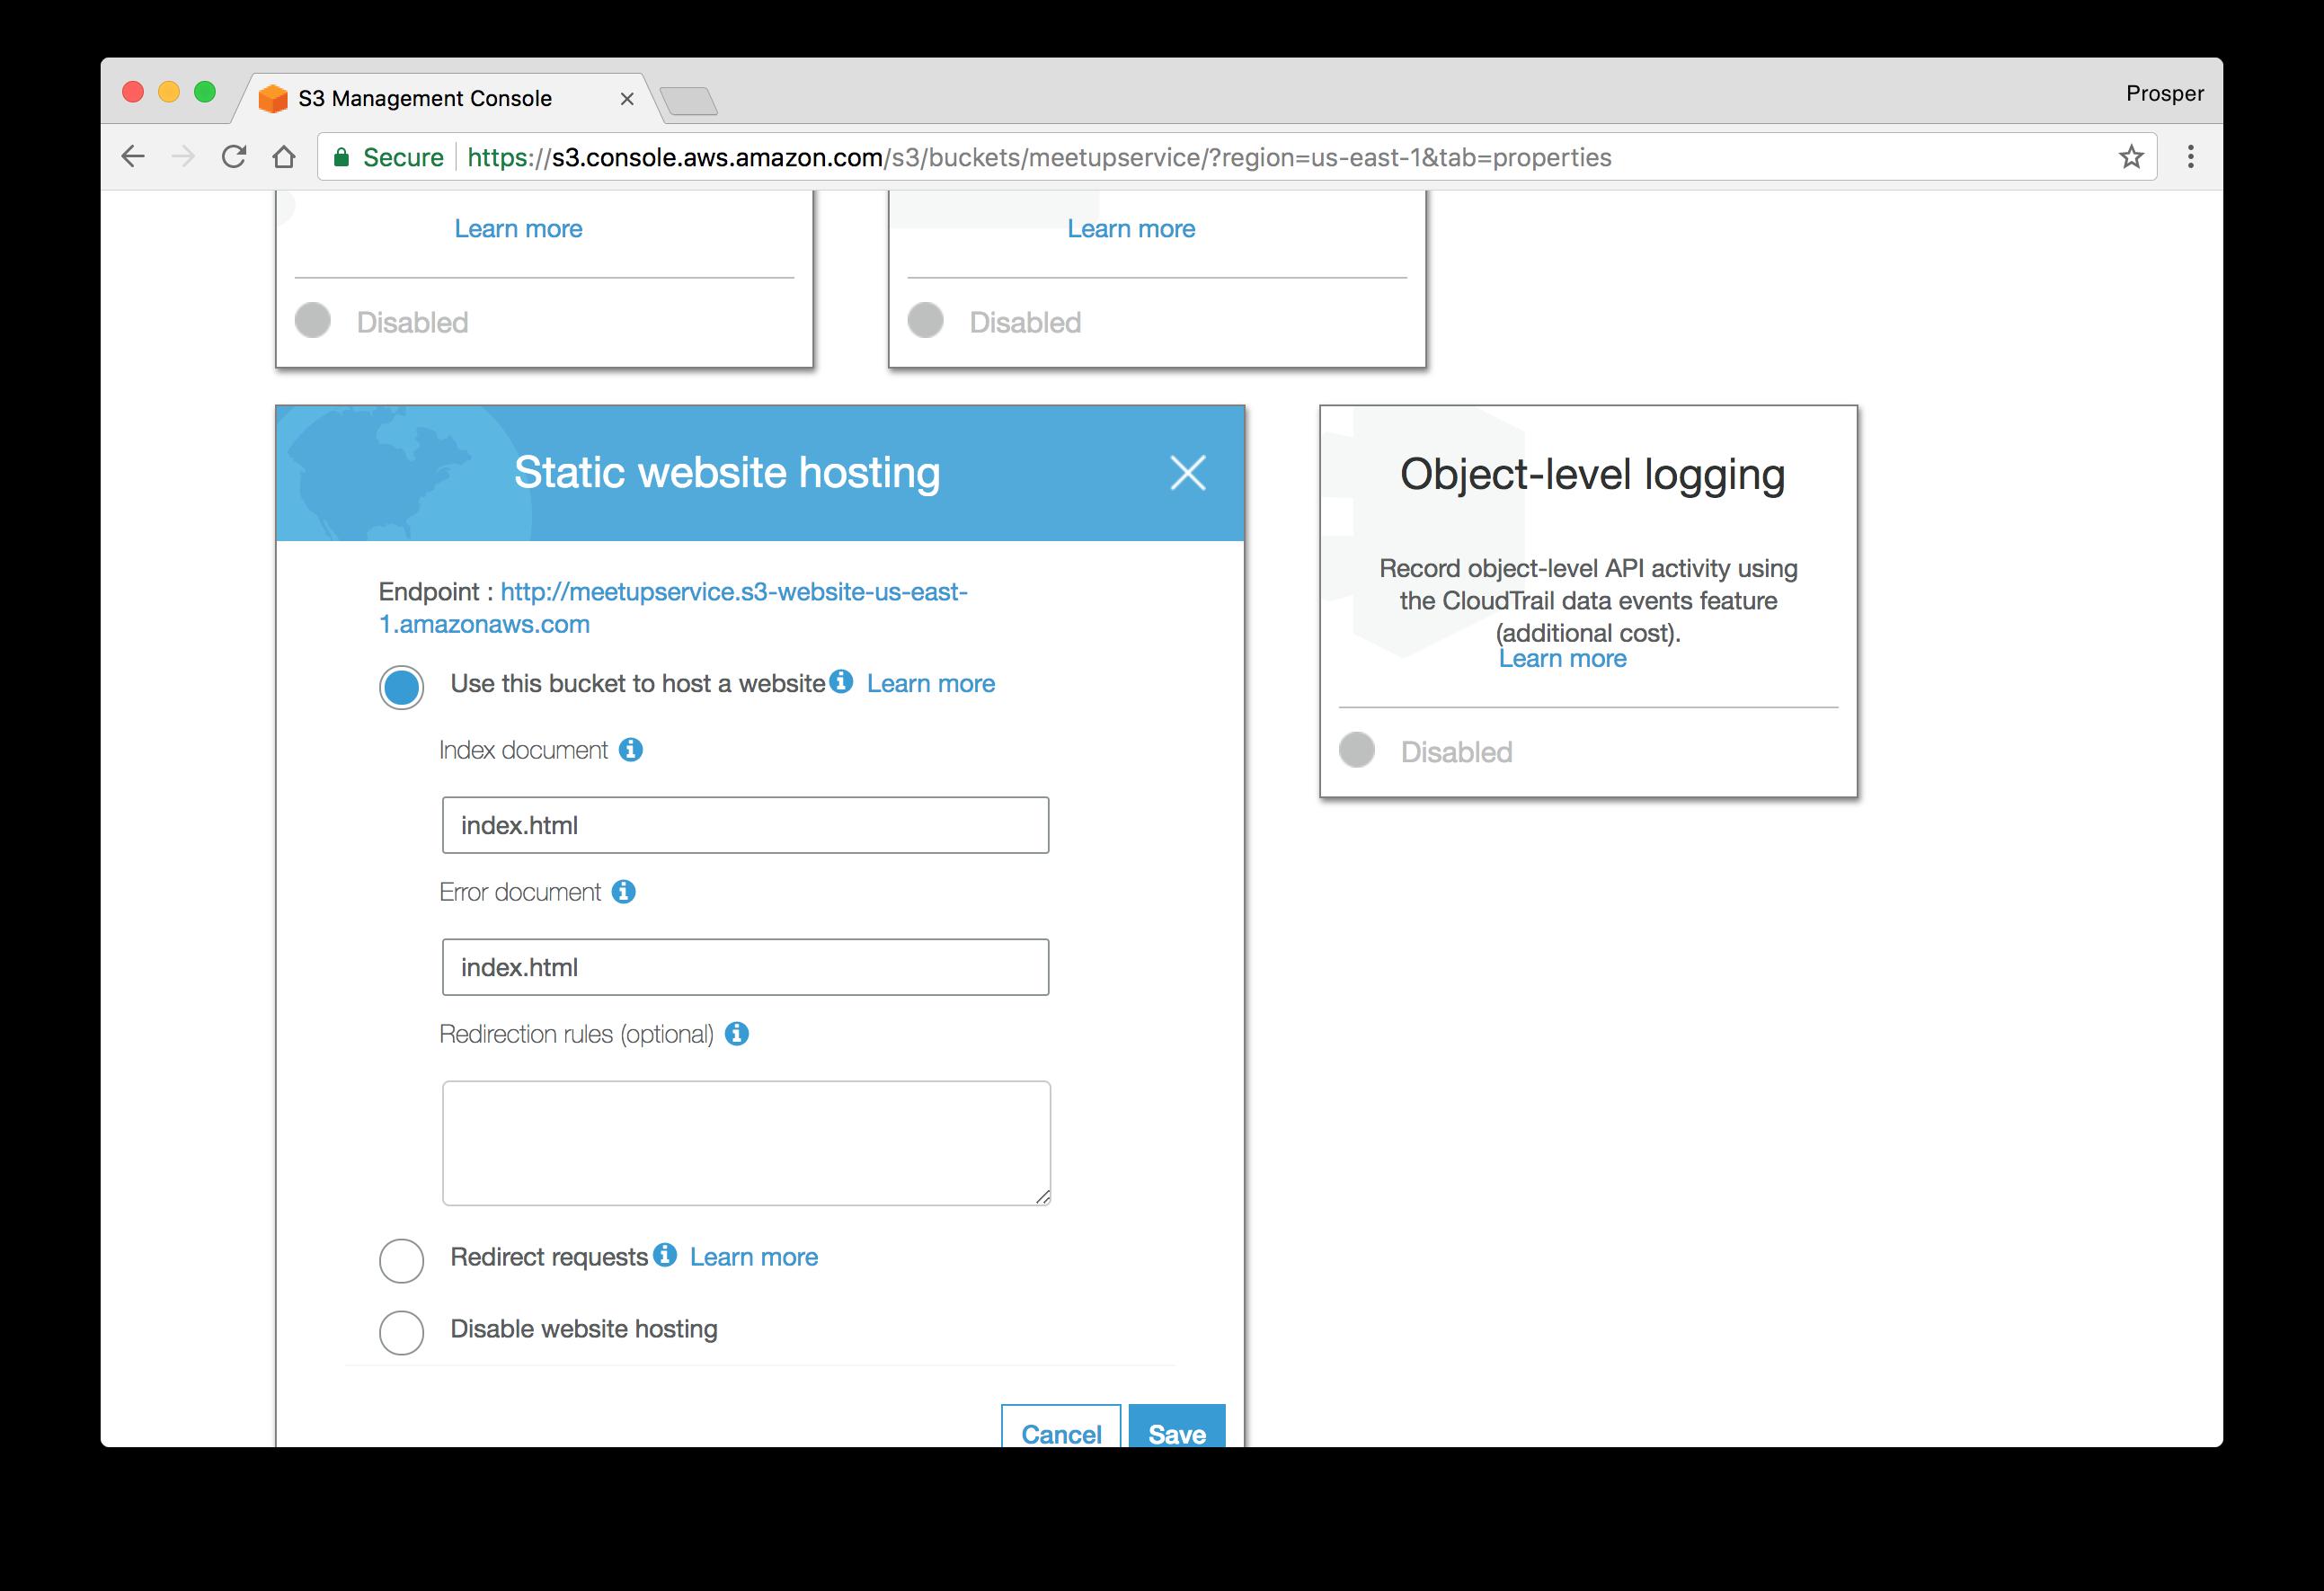 Enable Static Web hosting